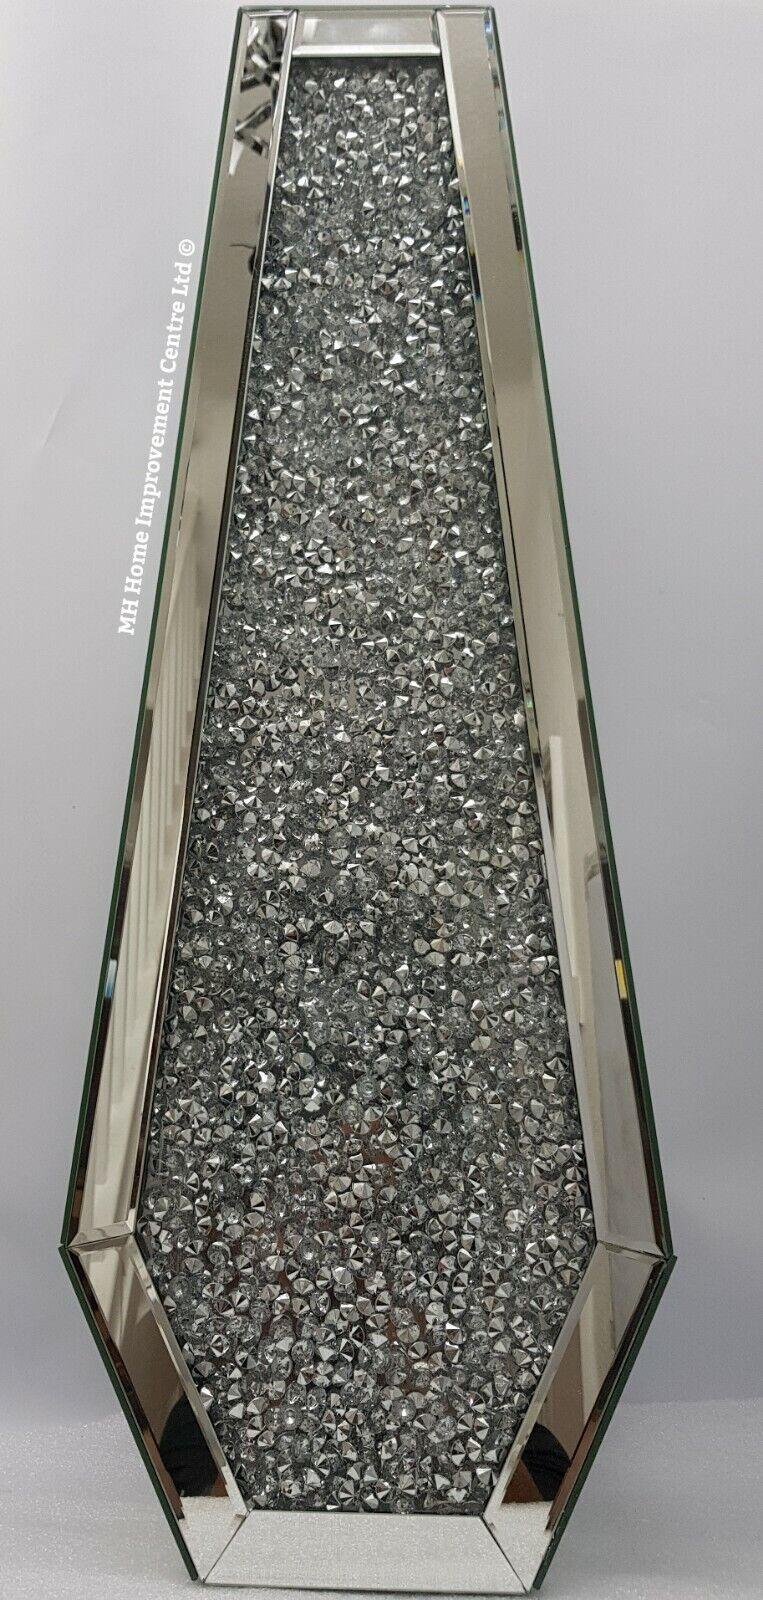 Silver Decorative Floor Vase Mirrored Sparkly Diamond Crush